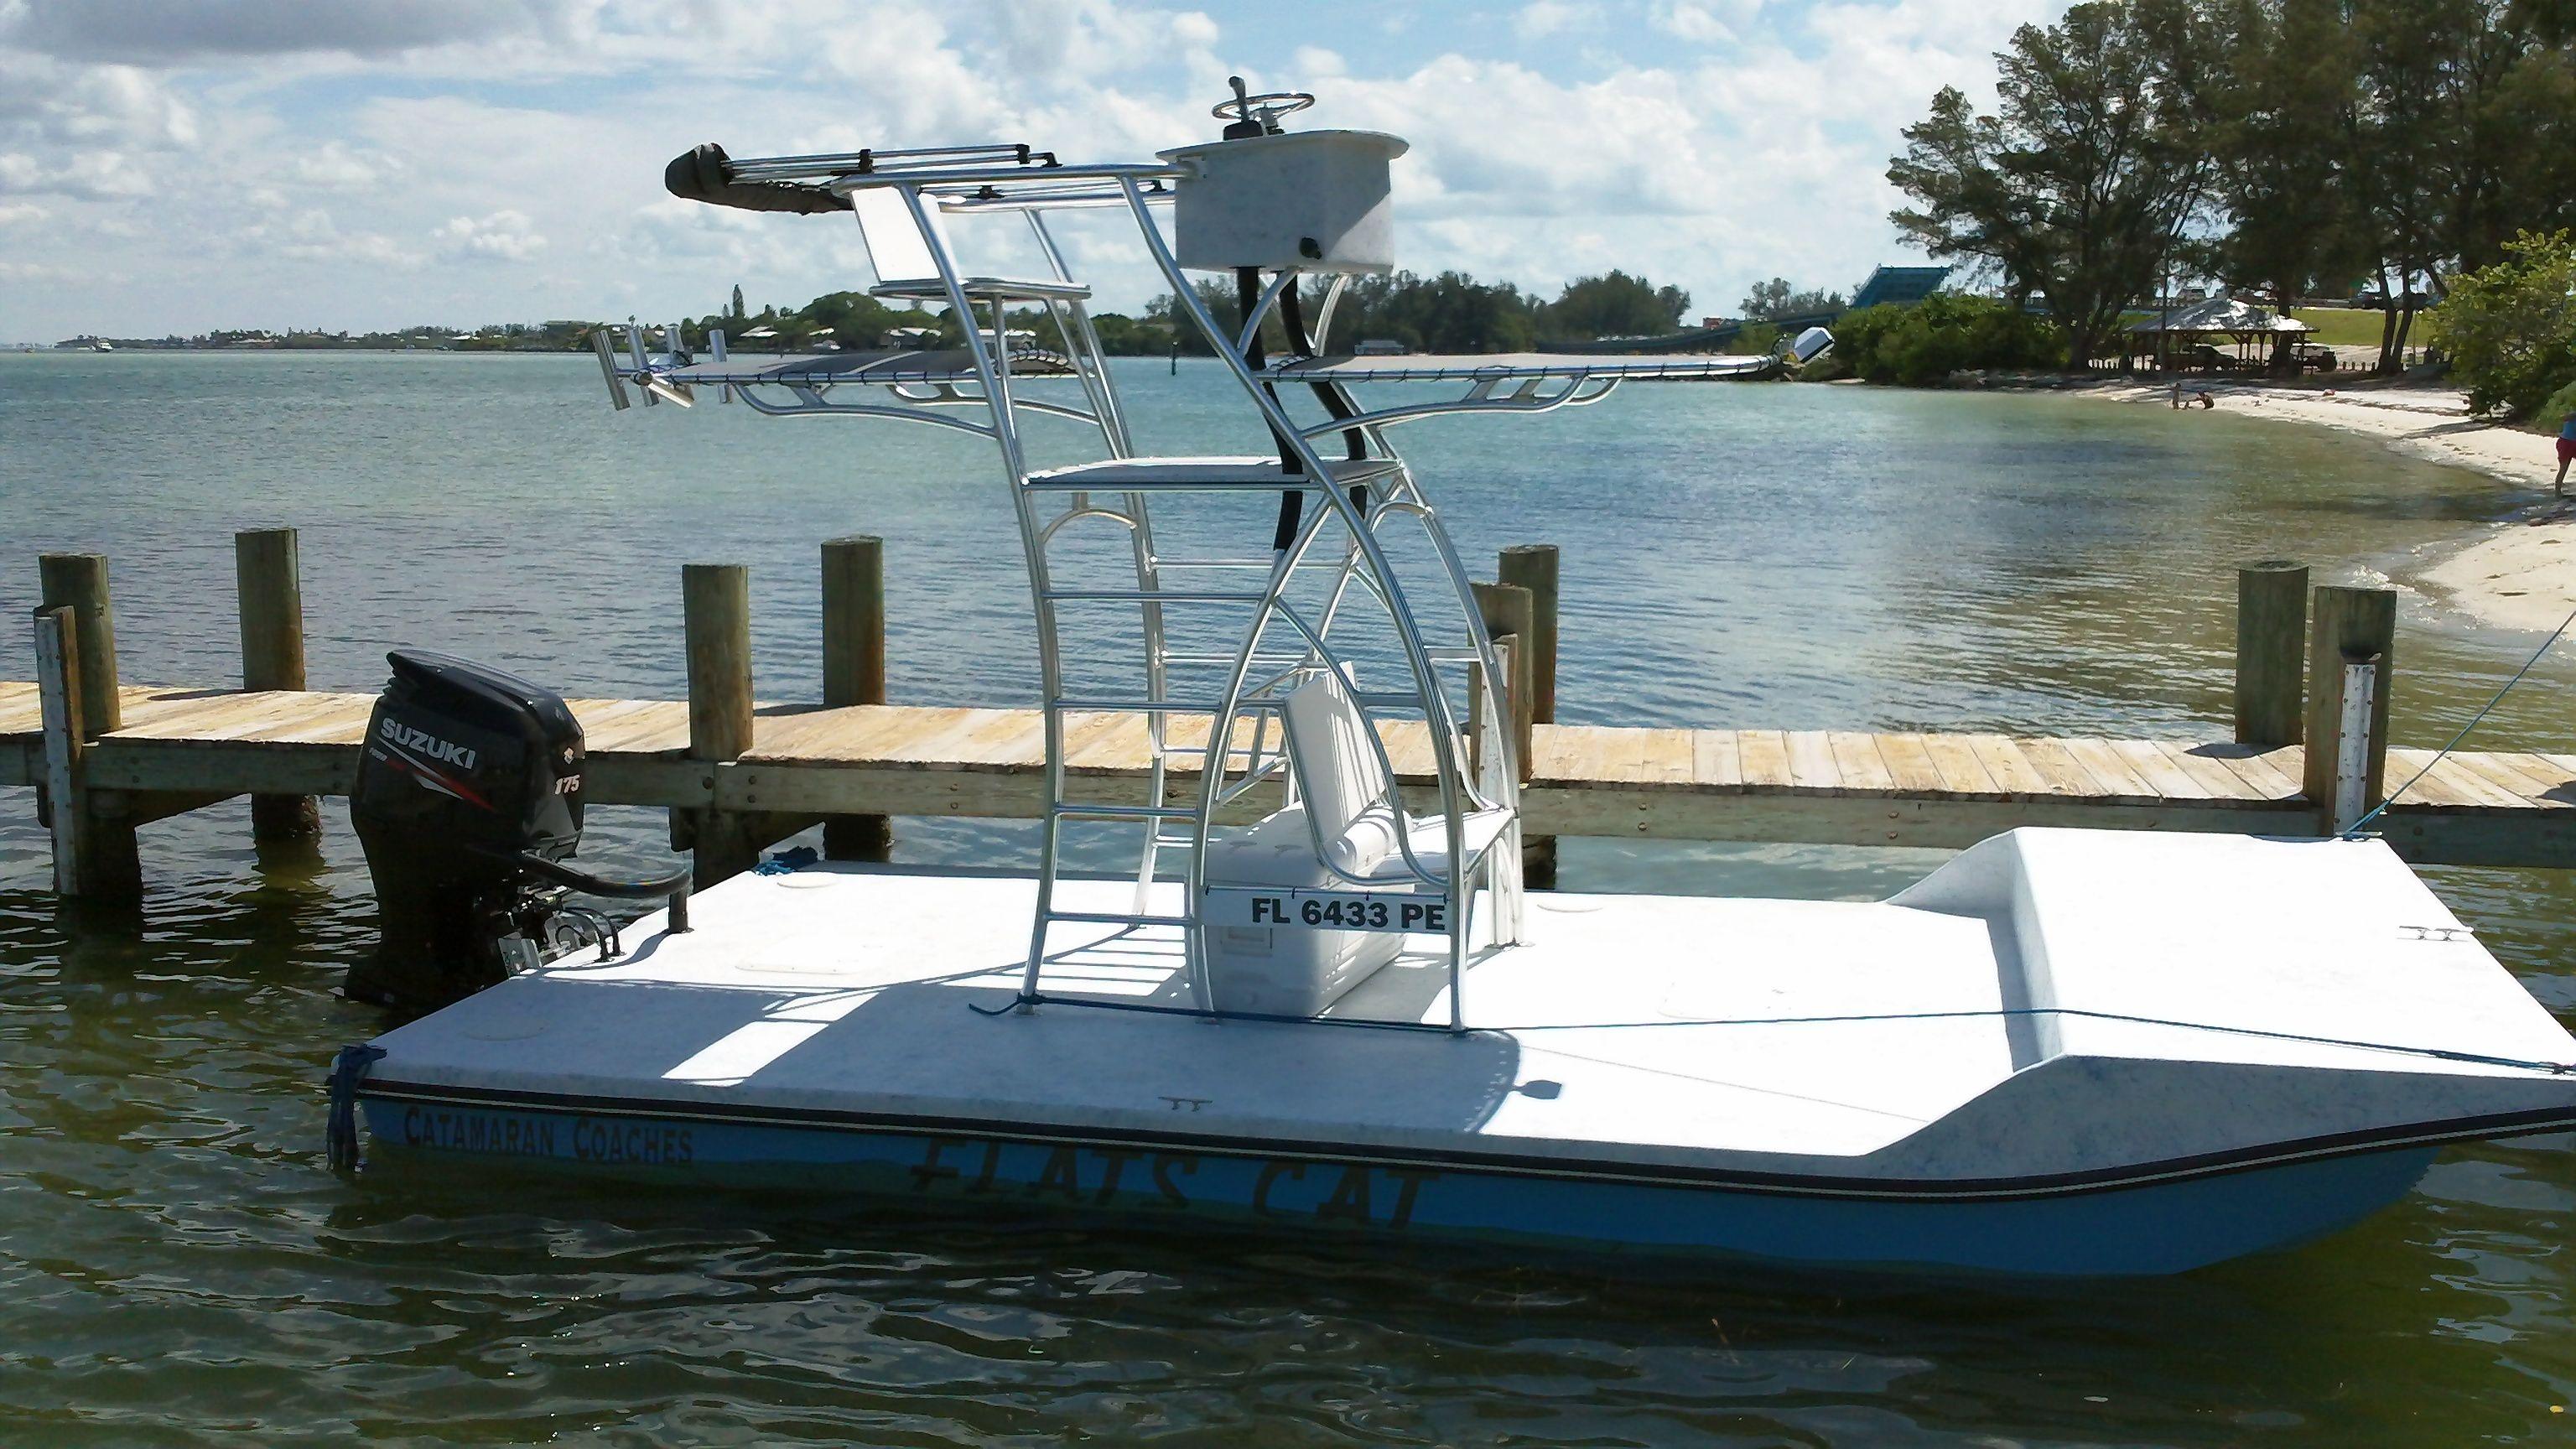 Flats Cat by catamaran coaches | Small Catamarans | Shallow water boats, Boat, Flats boat